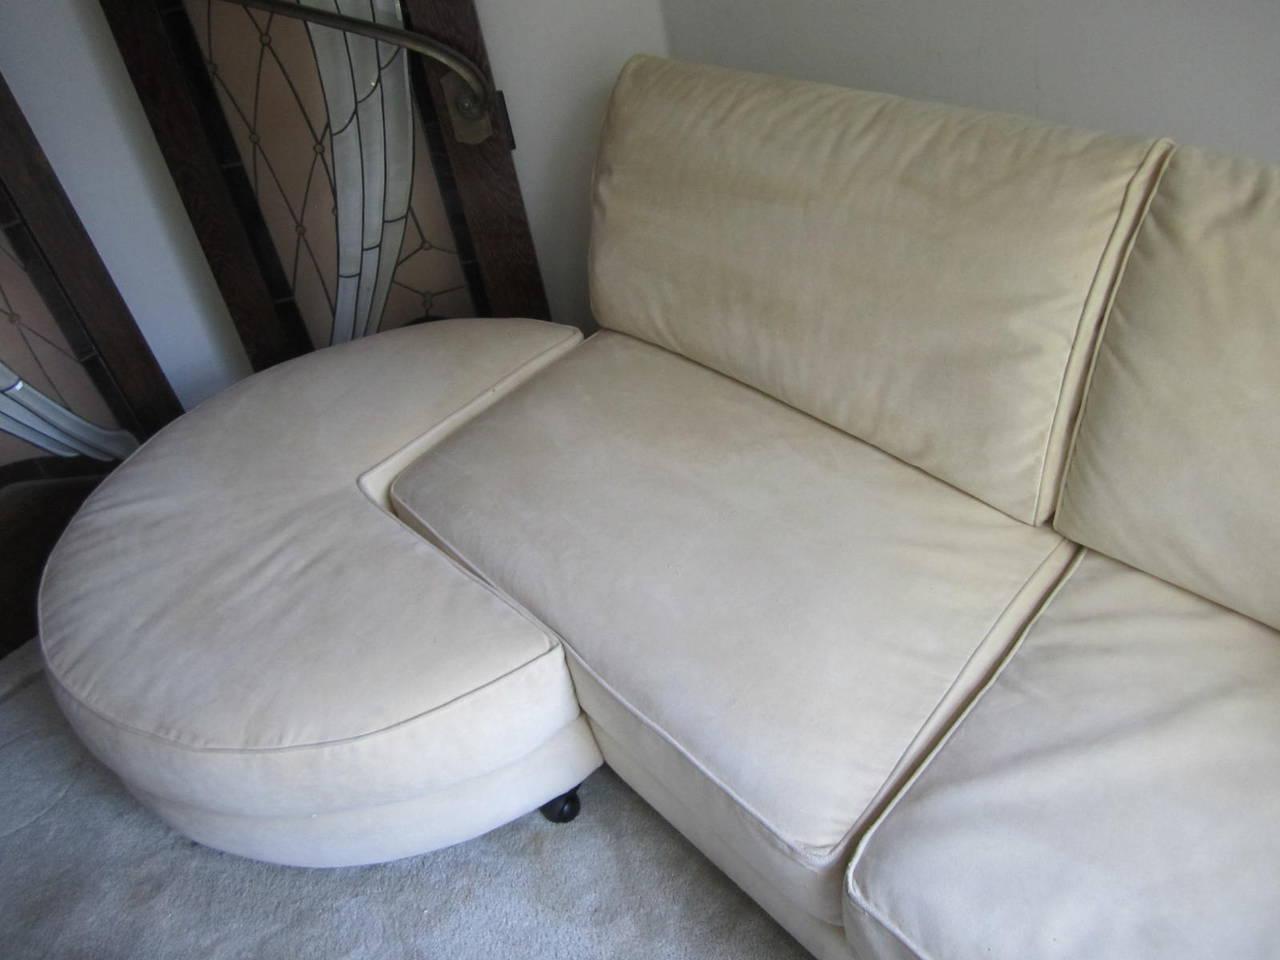 Stunning Italian Arketipo Roche Bobois Two-Piece Sofa Mid-Century Modern For Sale 2